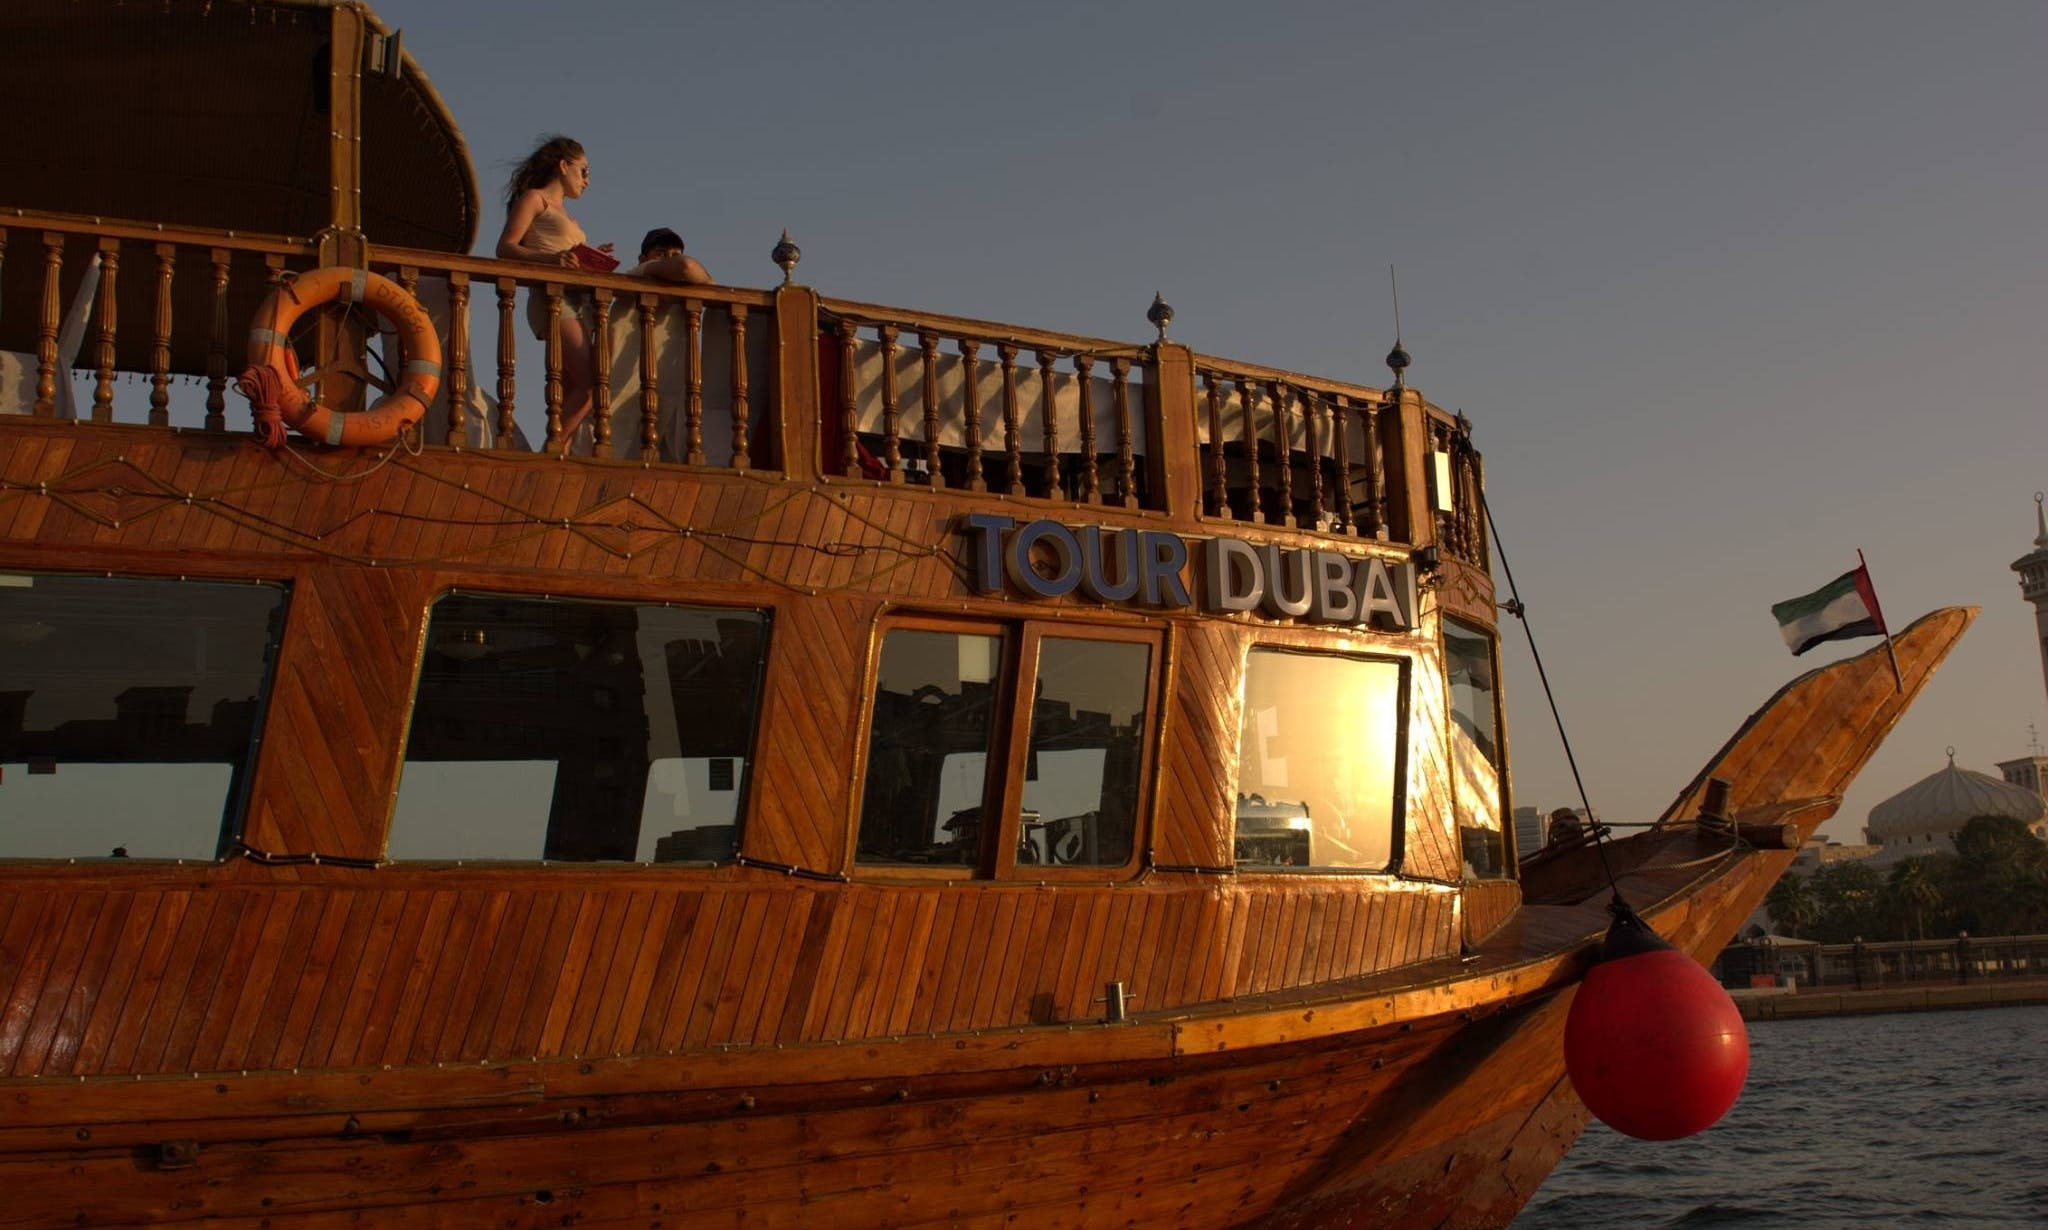 115' Tour Dubai Dhow Luxury Cruises in Dubai